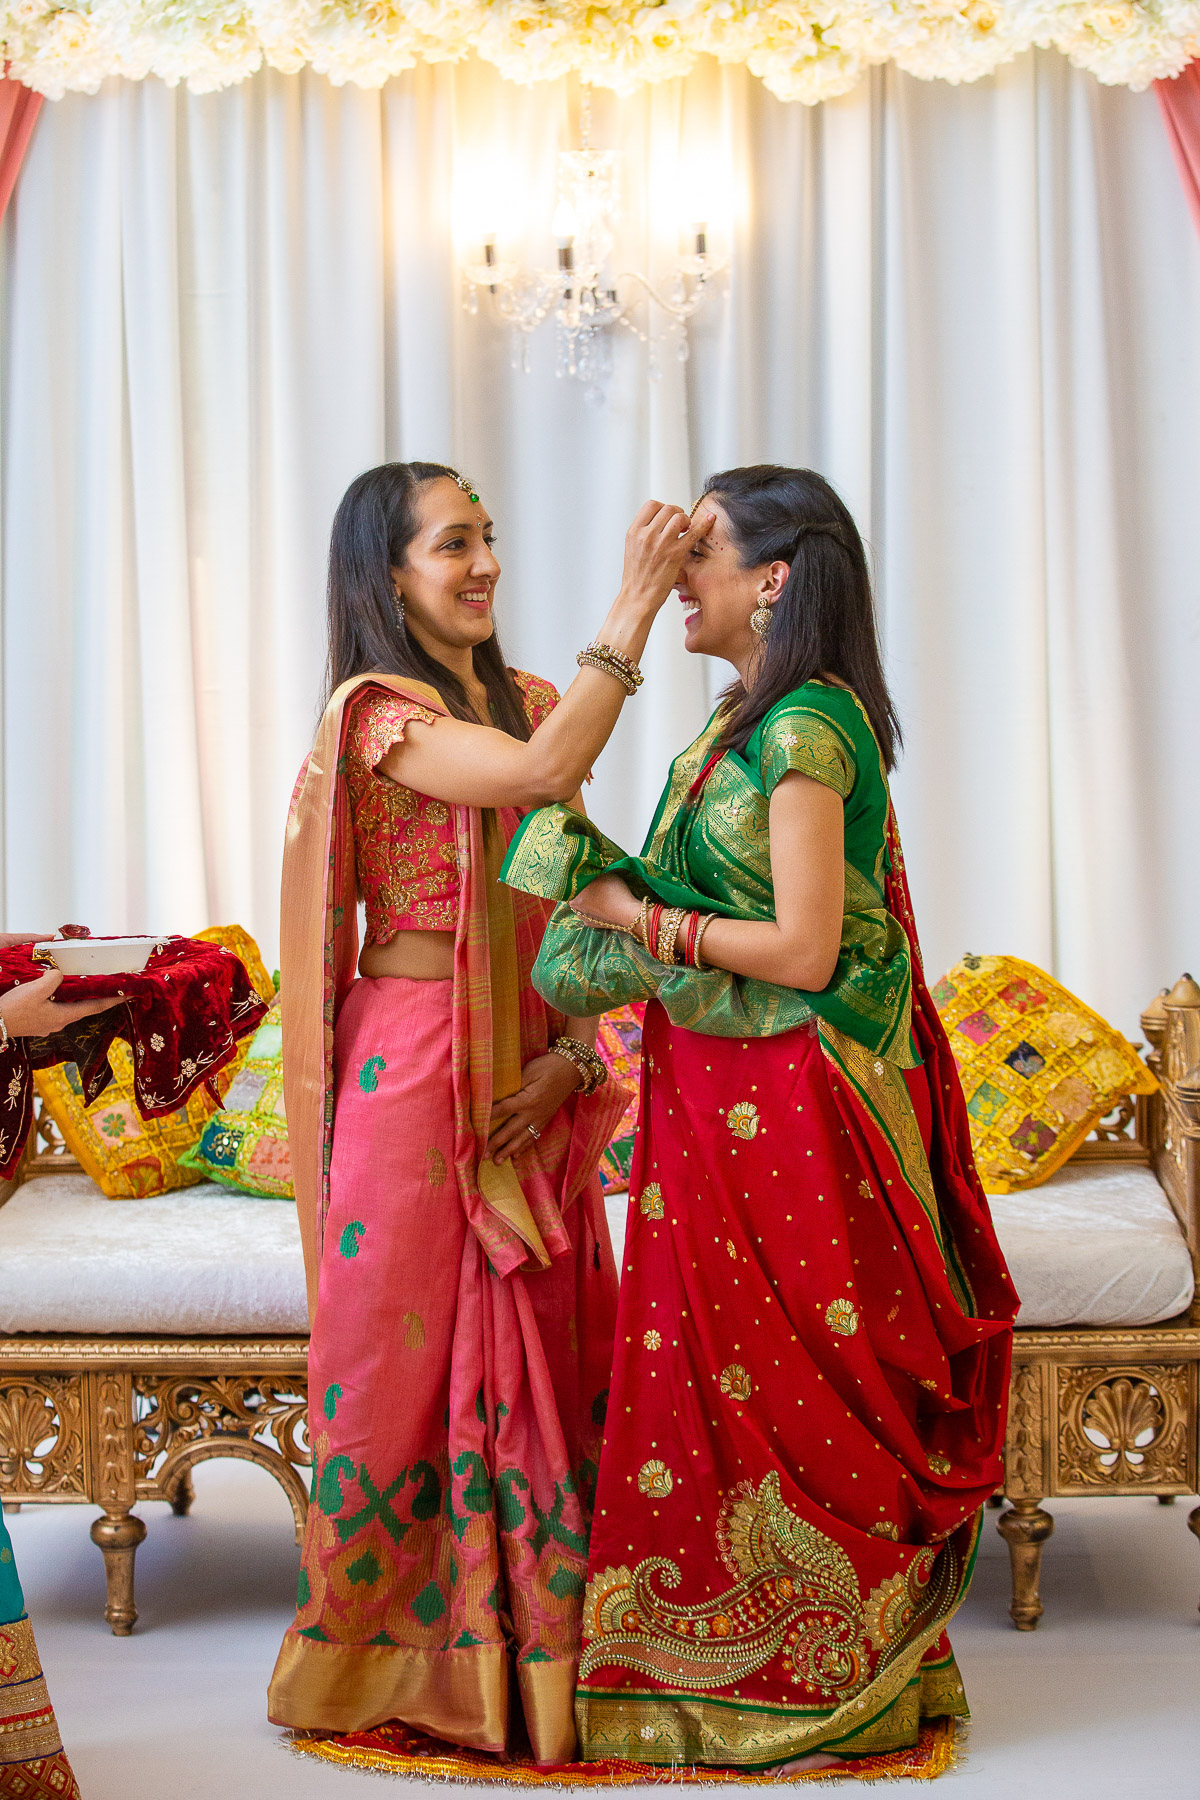 Asian-wedding-photographer-Bristol-hindu-baby-shower-godh-bharai-natalia-smith-photography-0035.jpg